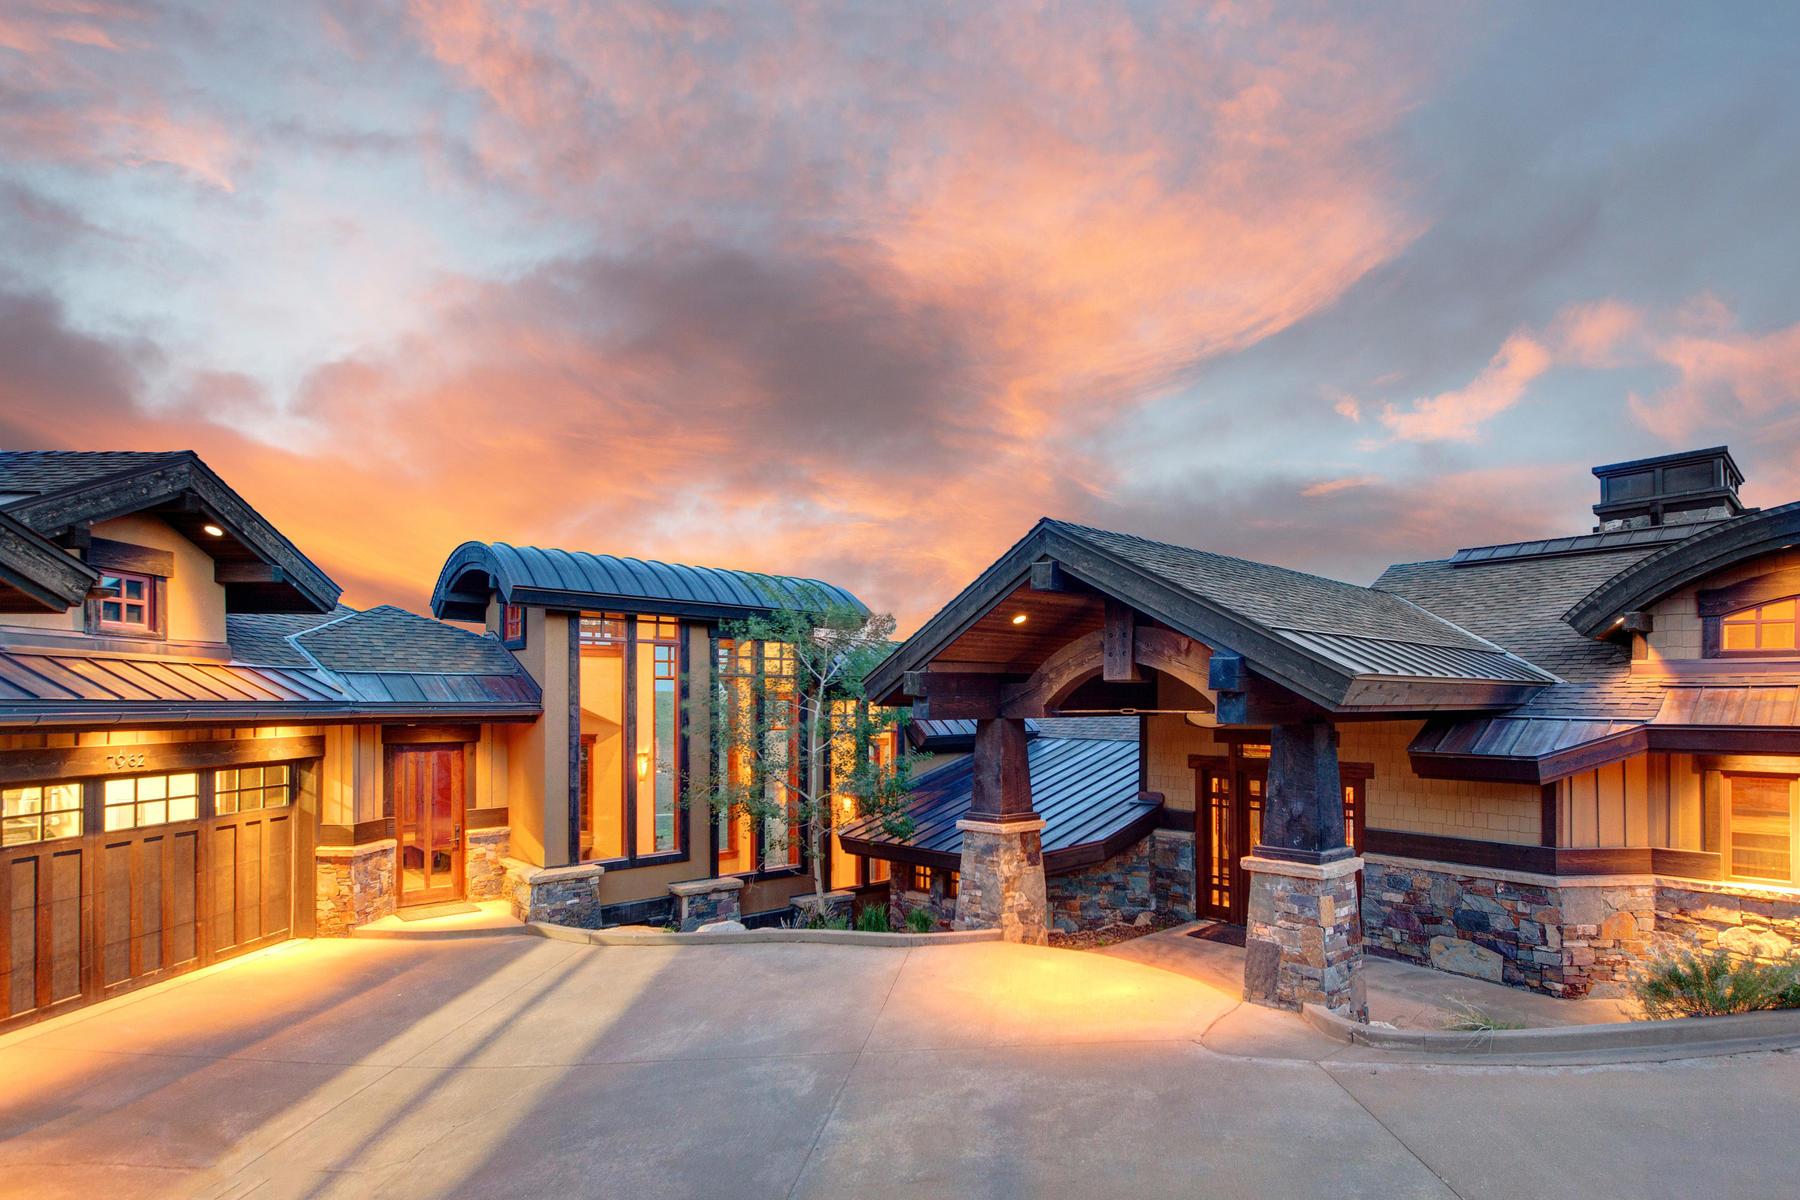 独户住宅 为 销售 在 Warm Contemporary Promontory Home With 270 Degree Mountain Views 7982 N Sunrise Lp 帕克城, 犹他州, 84098 美国